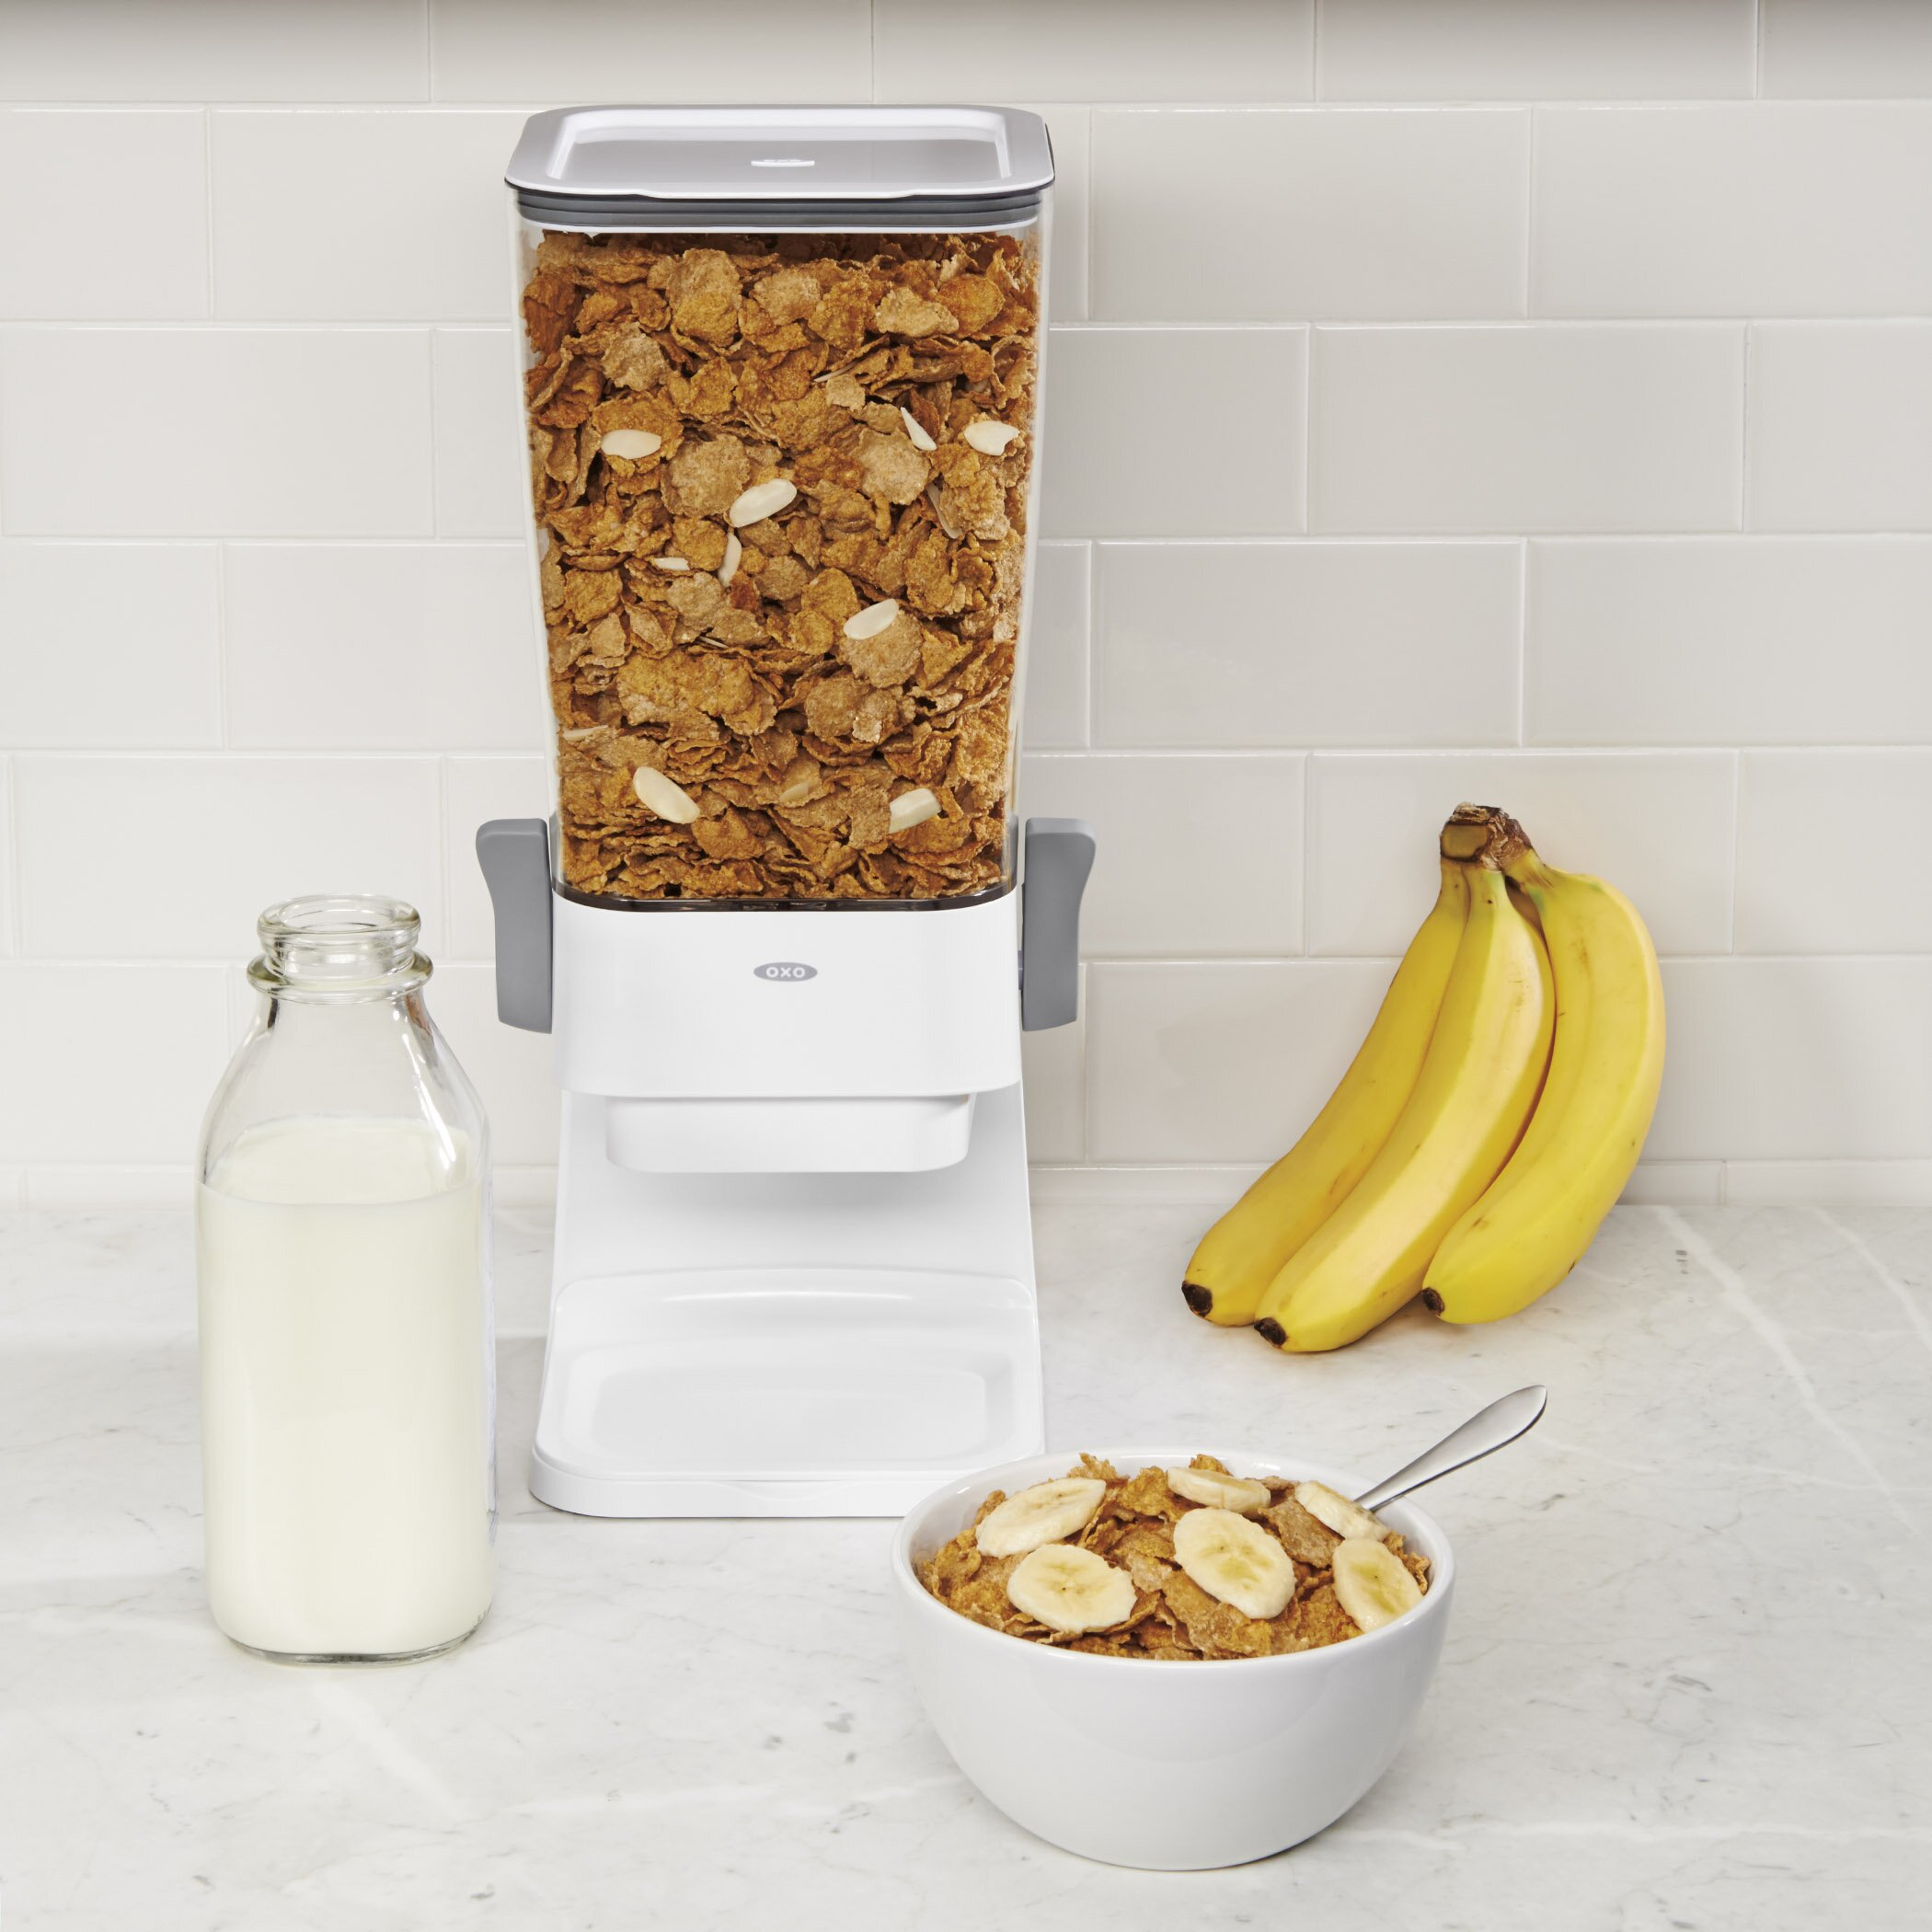 Oxo Good Grip 5 5 Quart Countertop Cereal Dispenser